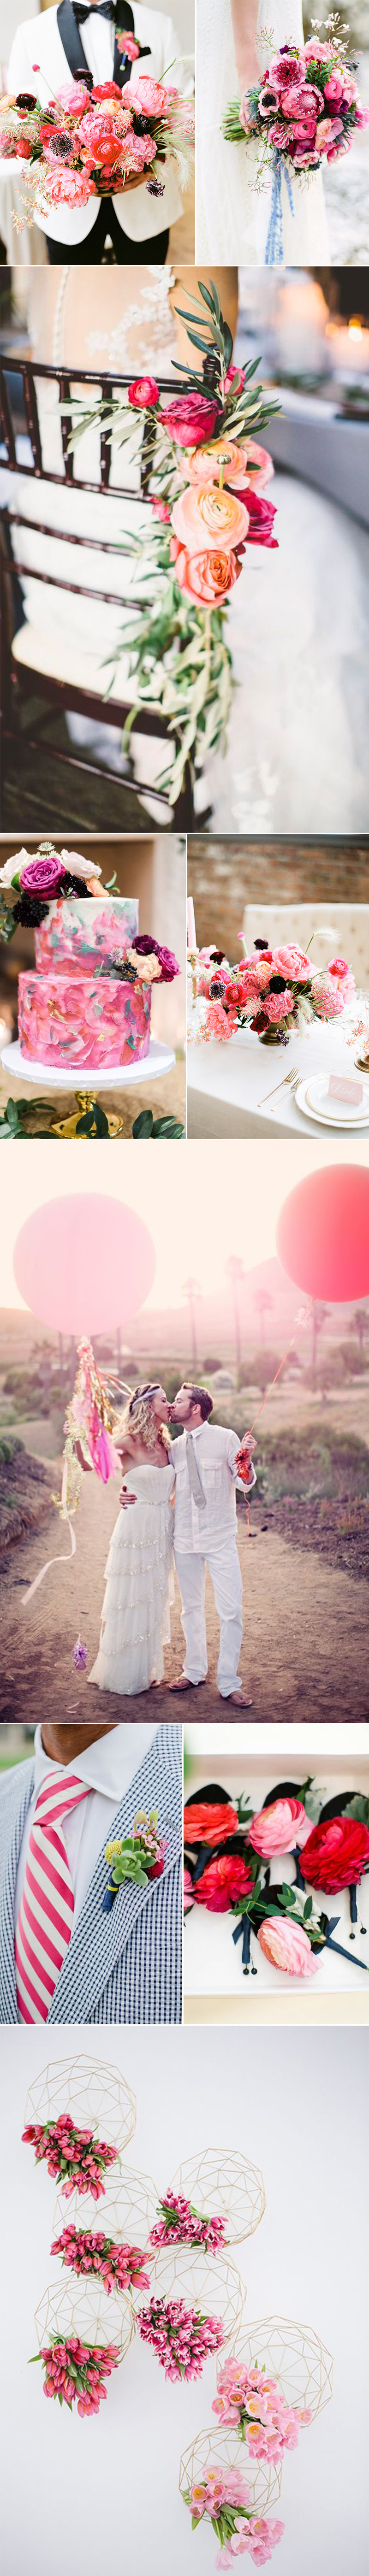 All Pink Wedding Ideas